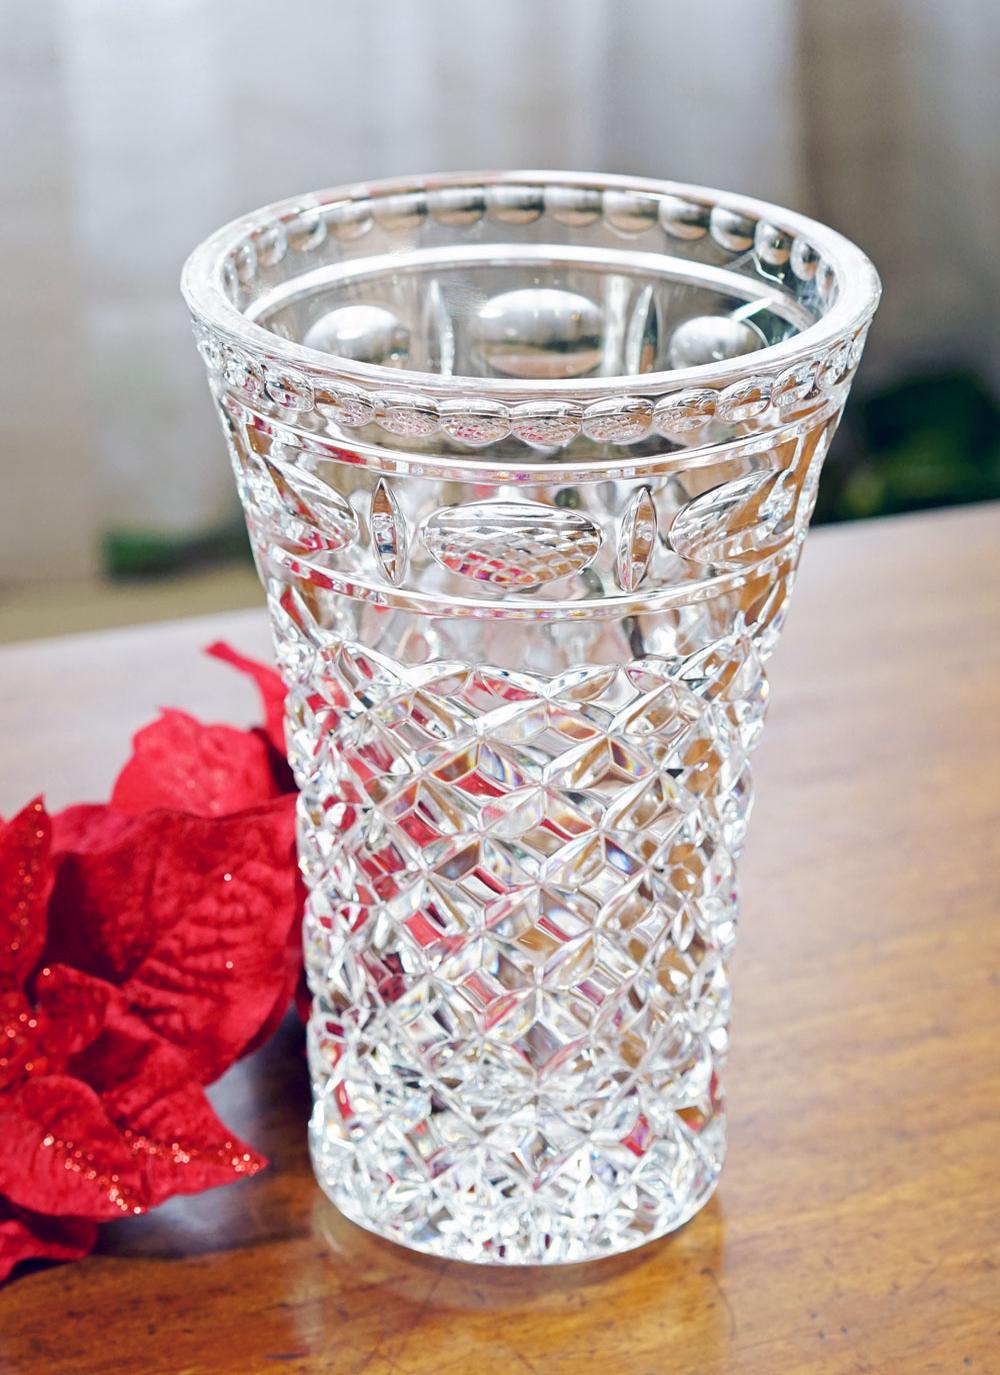 Waterford crystal leonora 10 inch vase blarney waterford crystal leonora 10 inch vase reviewsmspy